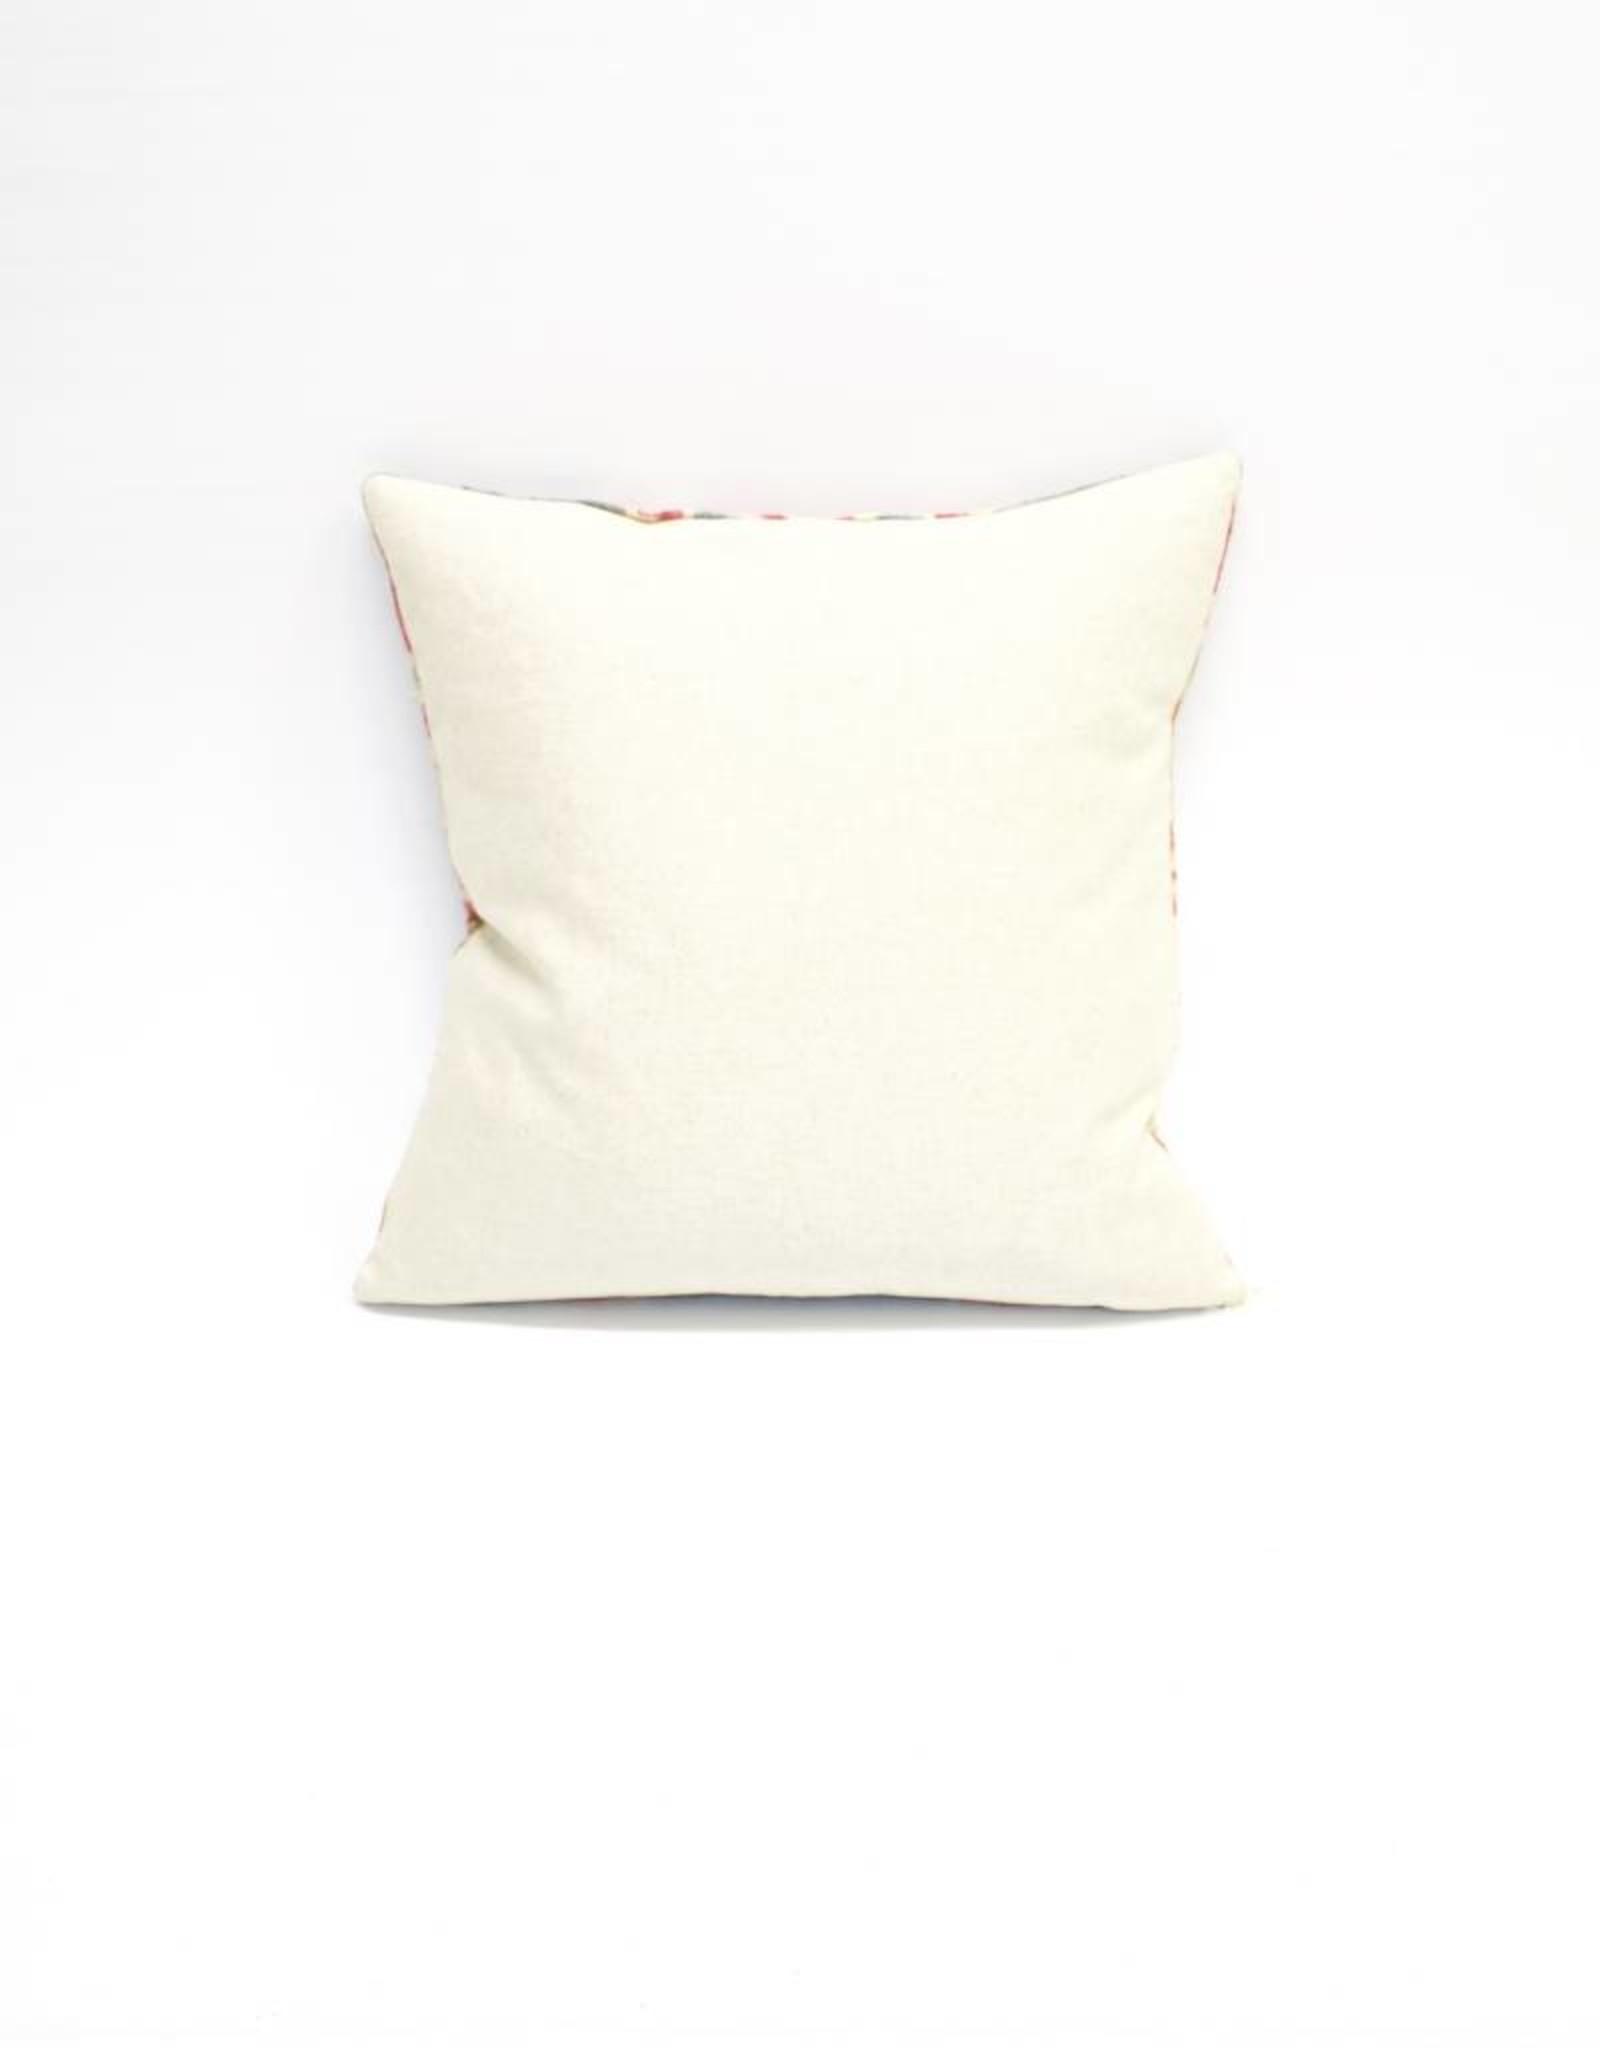 Tasdemir Rugs Ikat Silk Pillow - Square